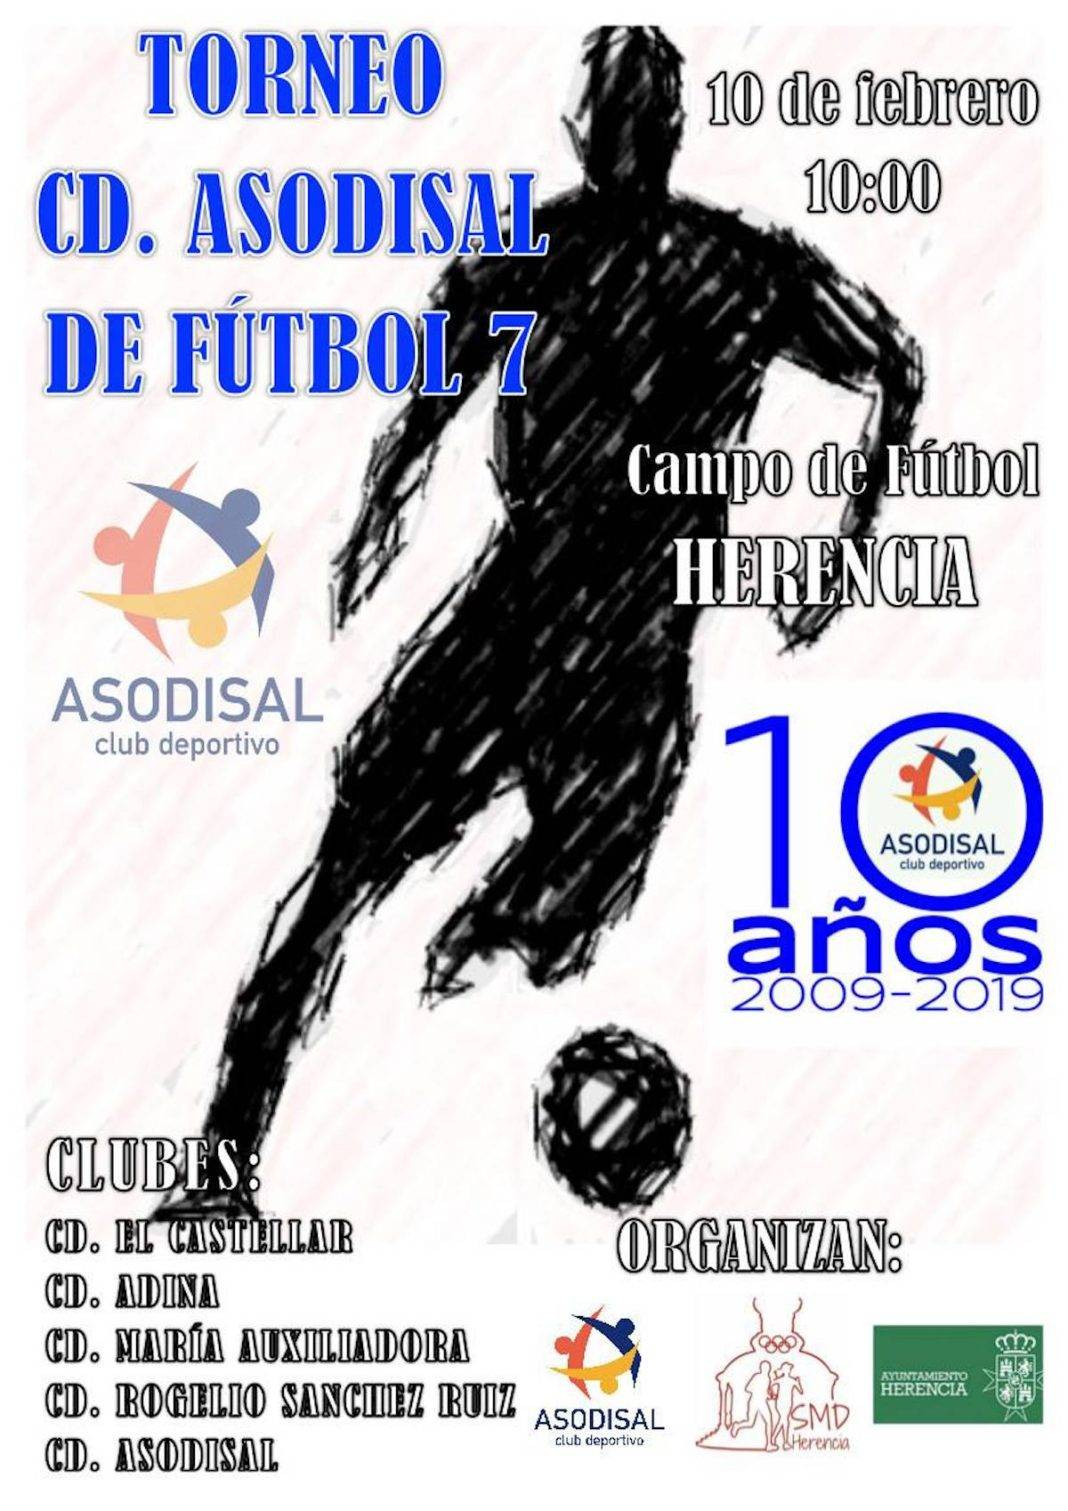 Torneo de fútbol 7 en Herencia organizado por CD. Asodisal 4